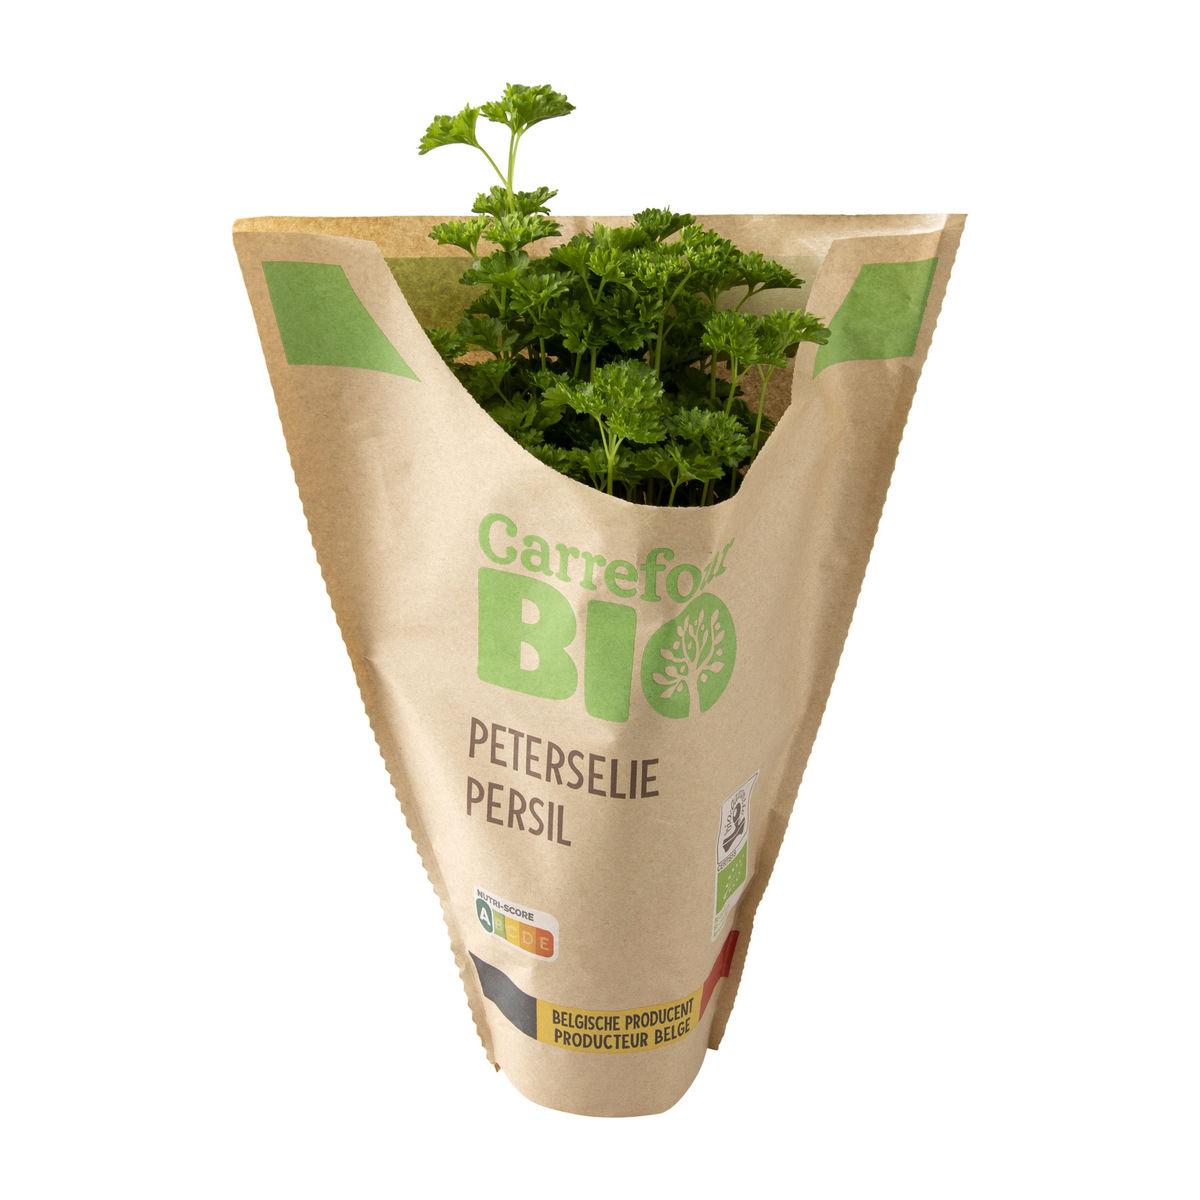 Carrefour BIO Persil en pot